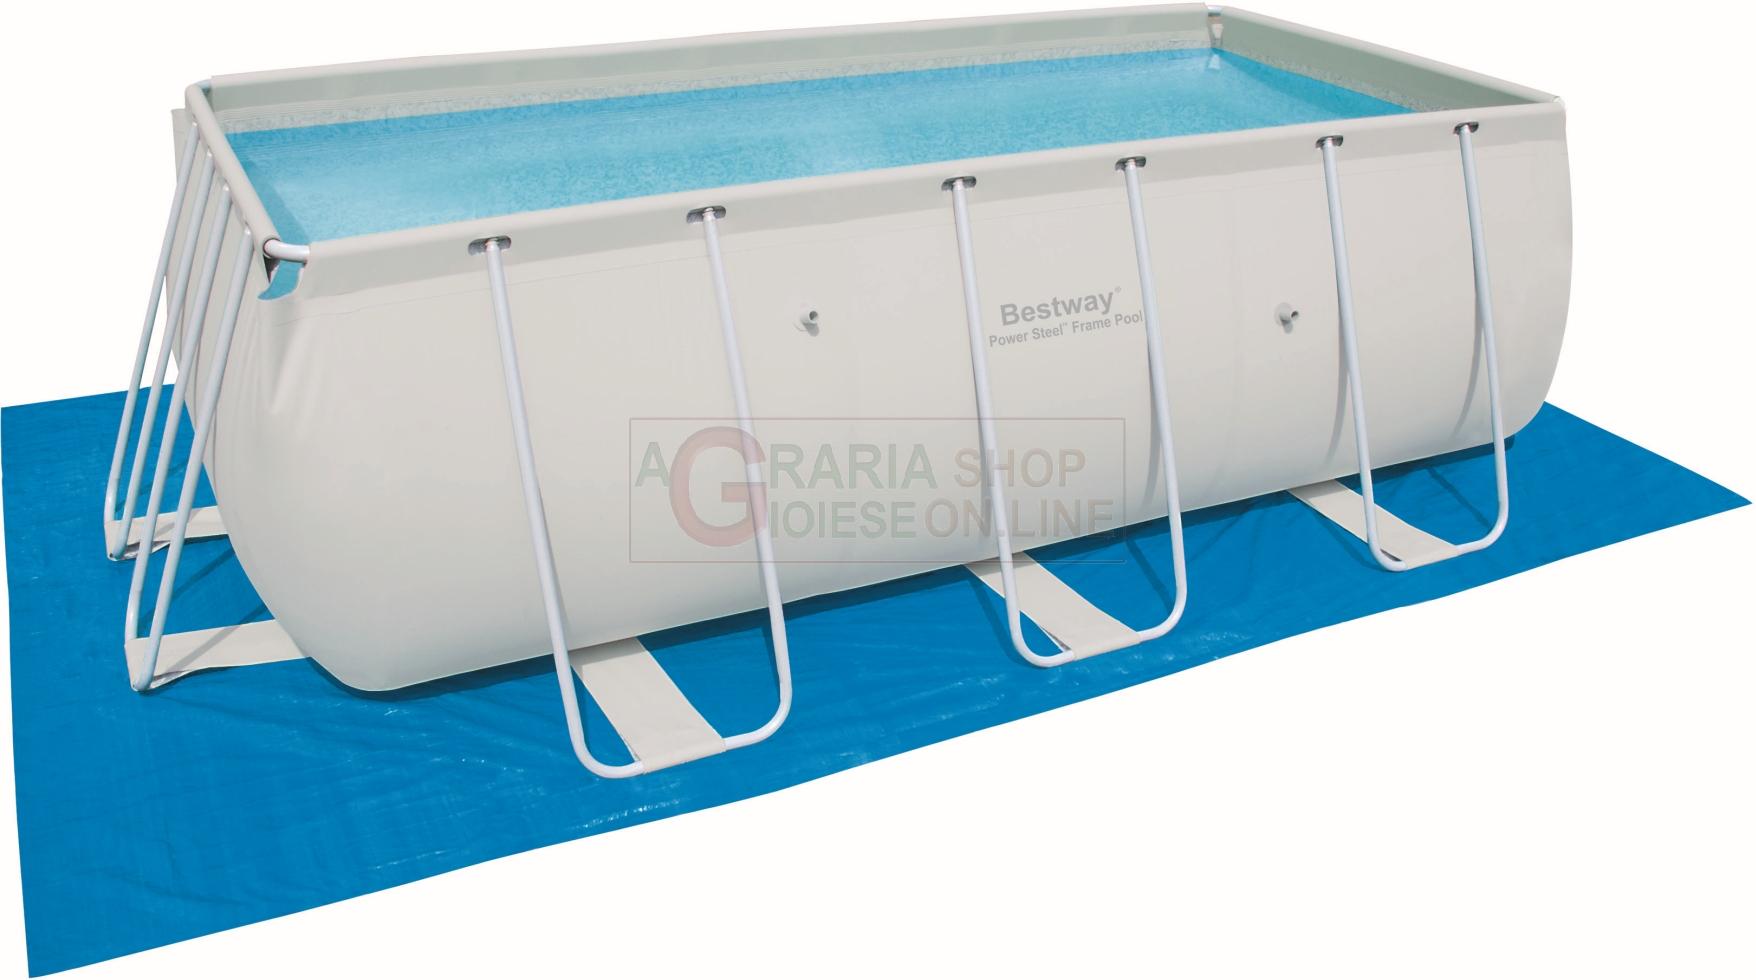 Bestway 58264 telo tappetino di base per piscine for Bestway italia piscine